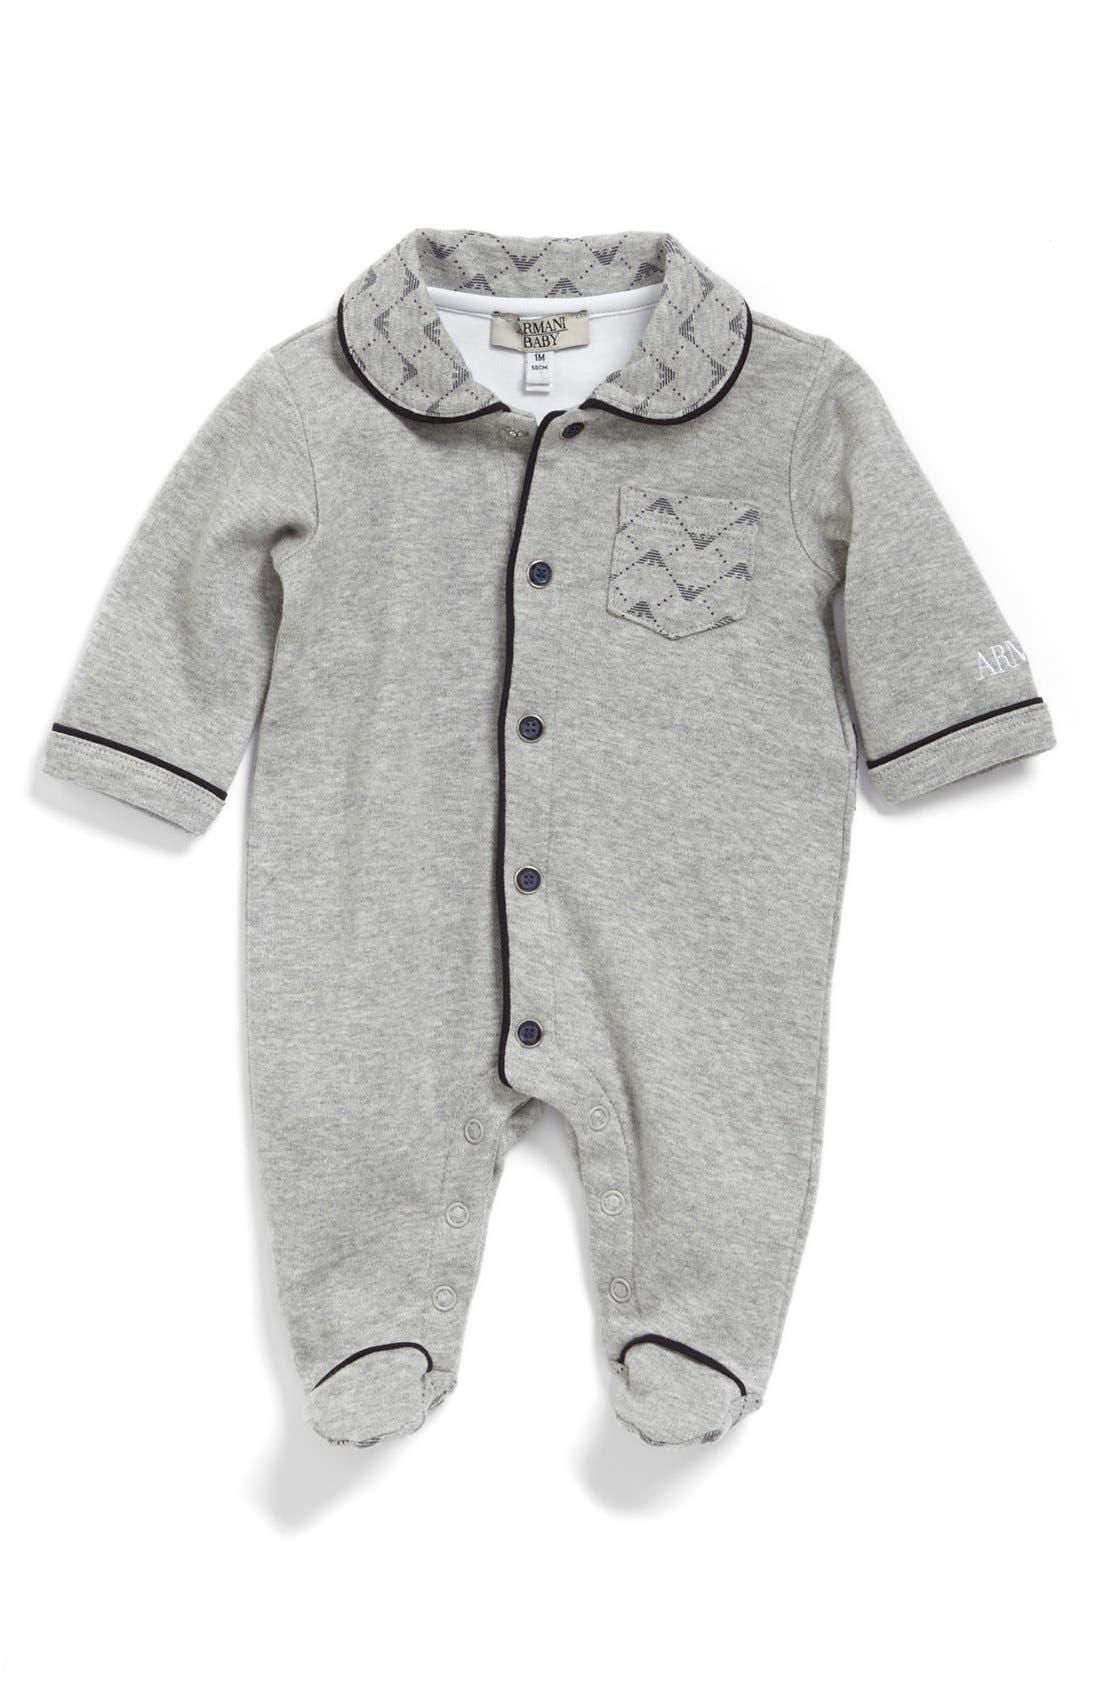 Alternate Image 1 Selected - Armani Junior Logo Collar One-Piece (Baby)